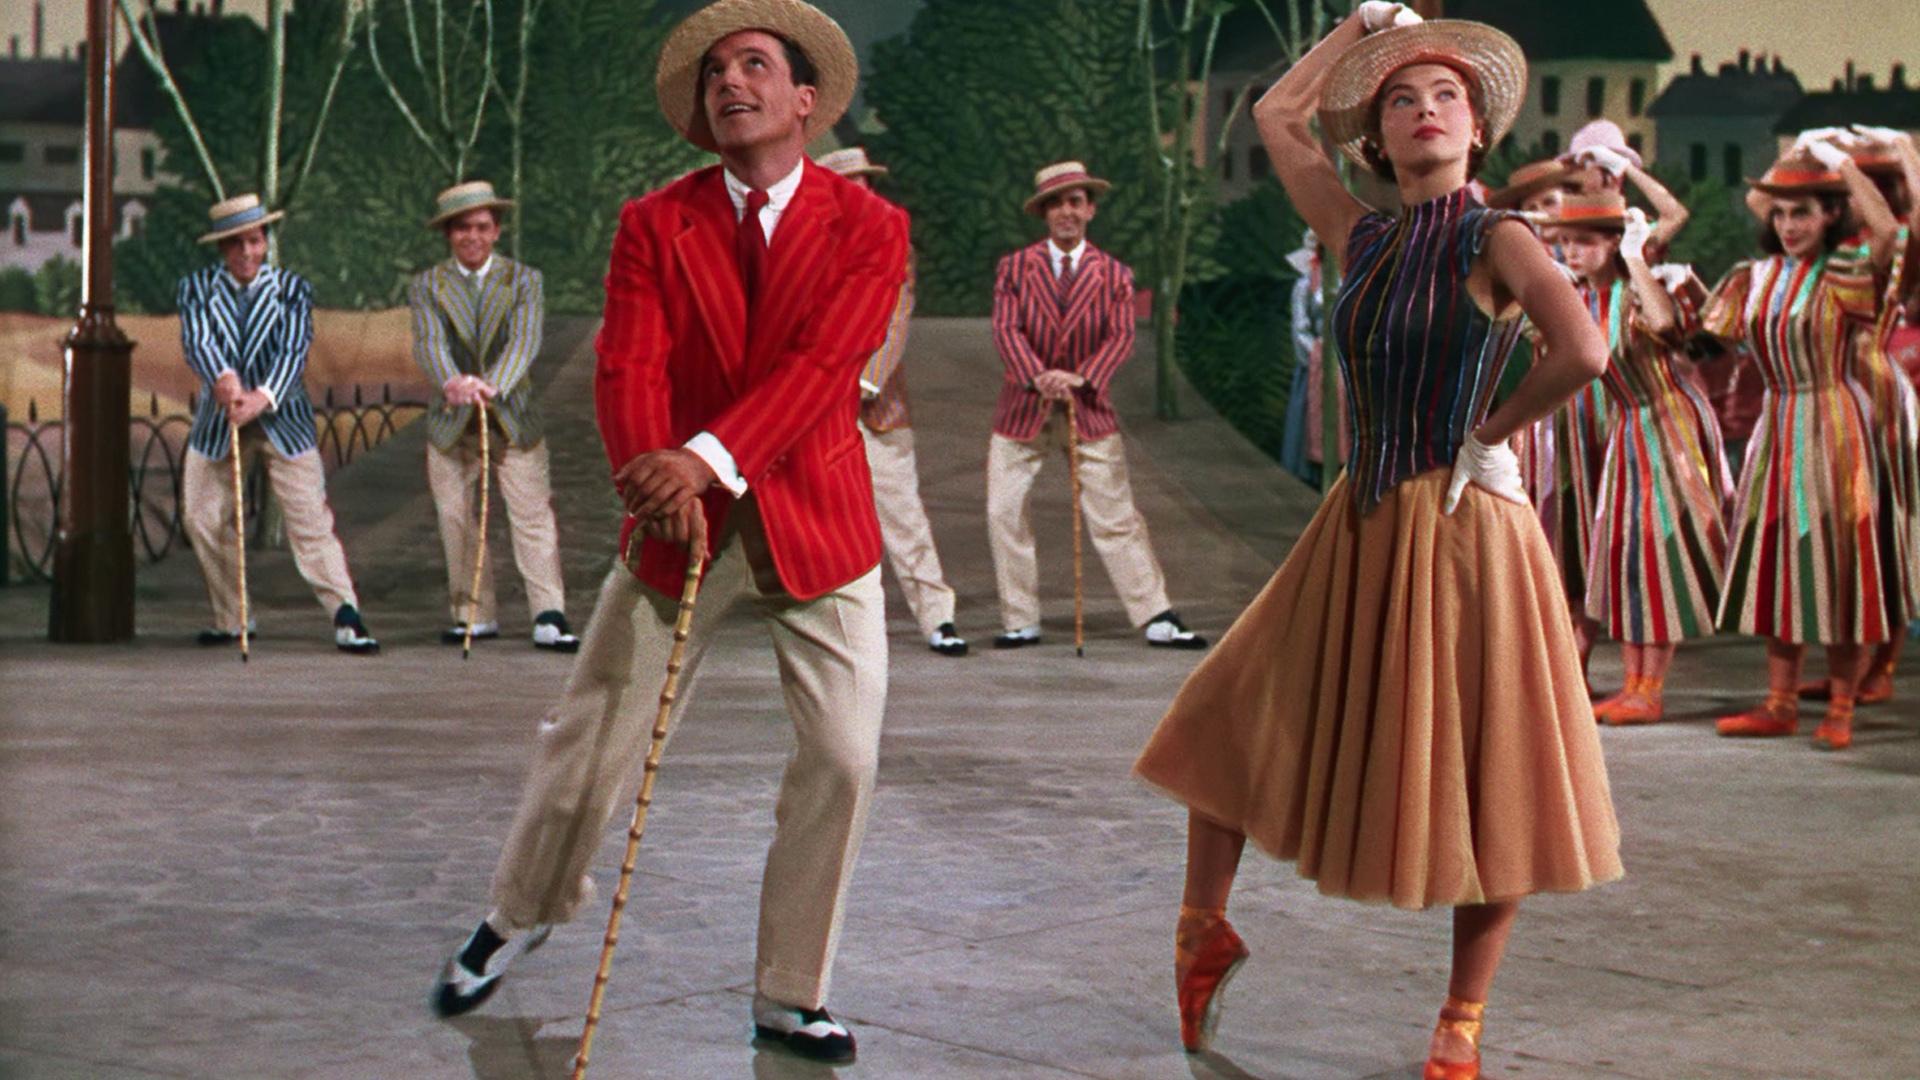 #77) An American in Paris - (1951 - dir. Vincente Minnelli)